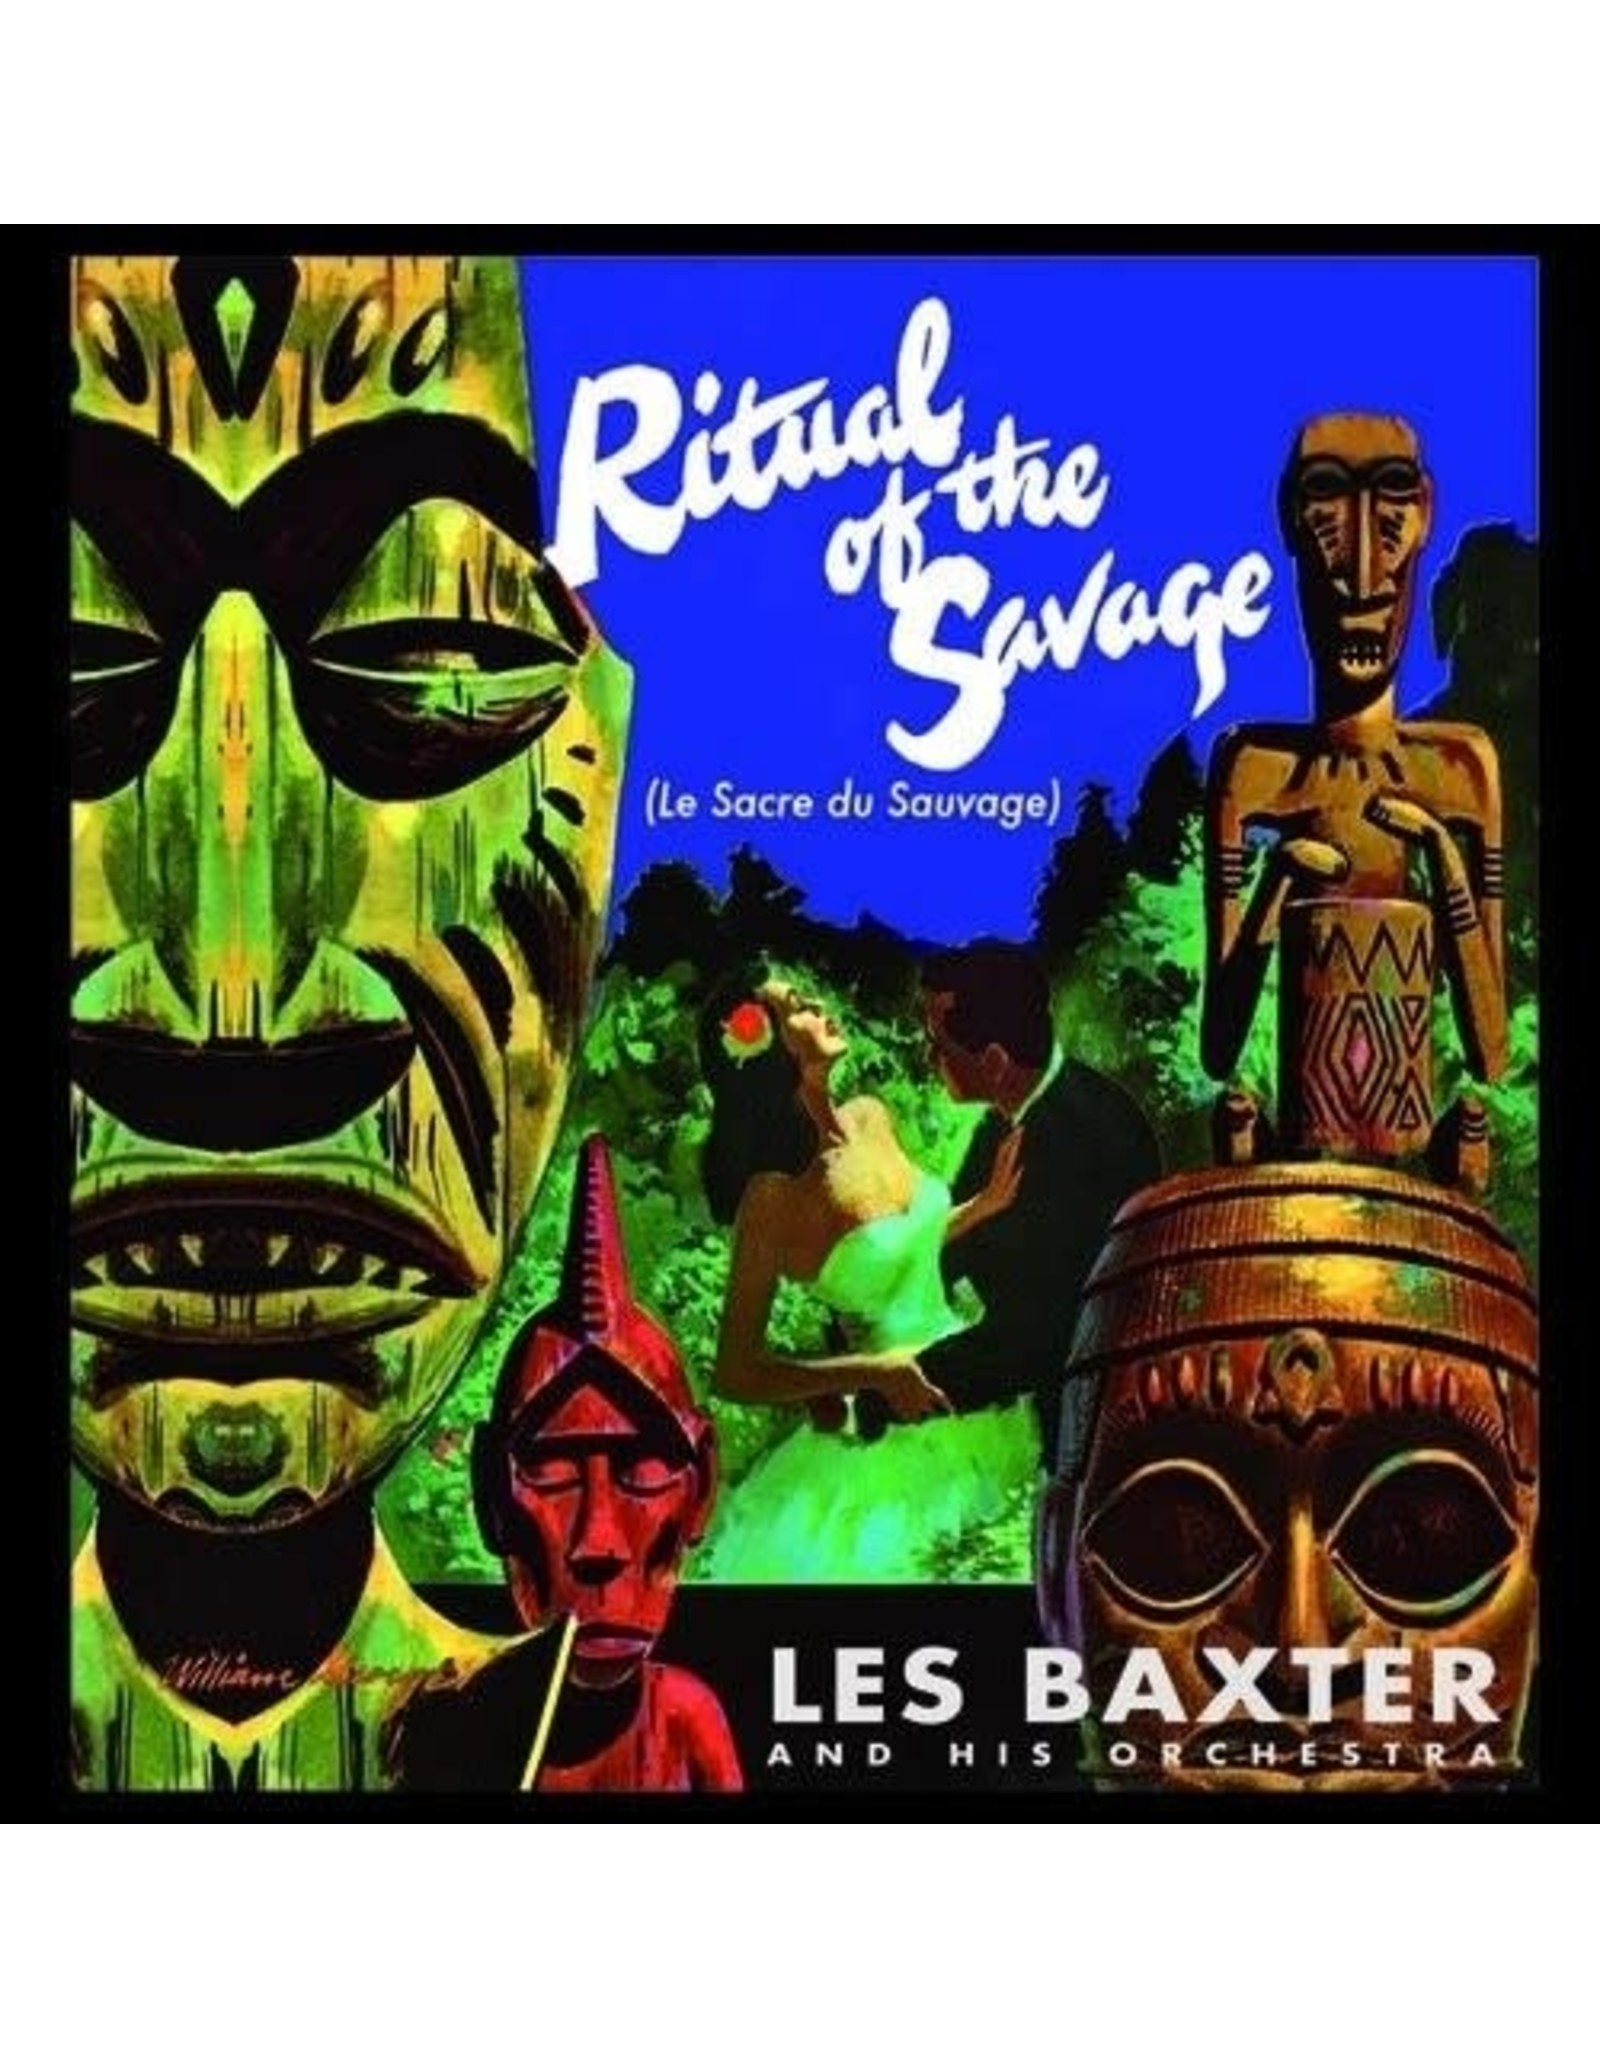 New Vinyl Les Baxter - Ritual Of The Savage + Bonus Tracks (Spain Import, 180g Colored) LP